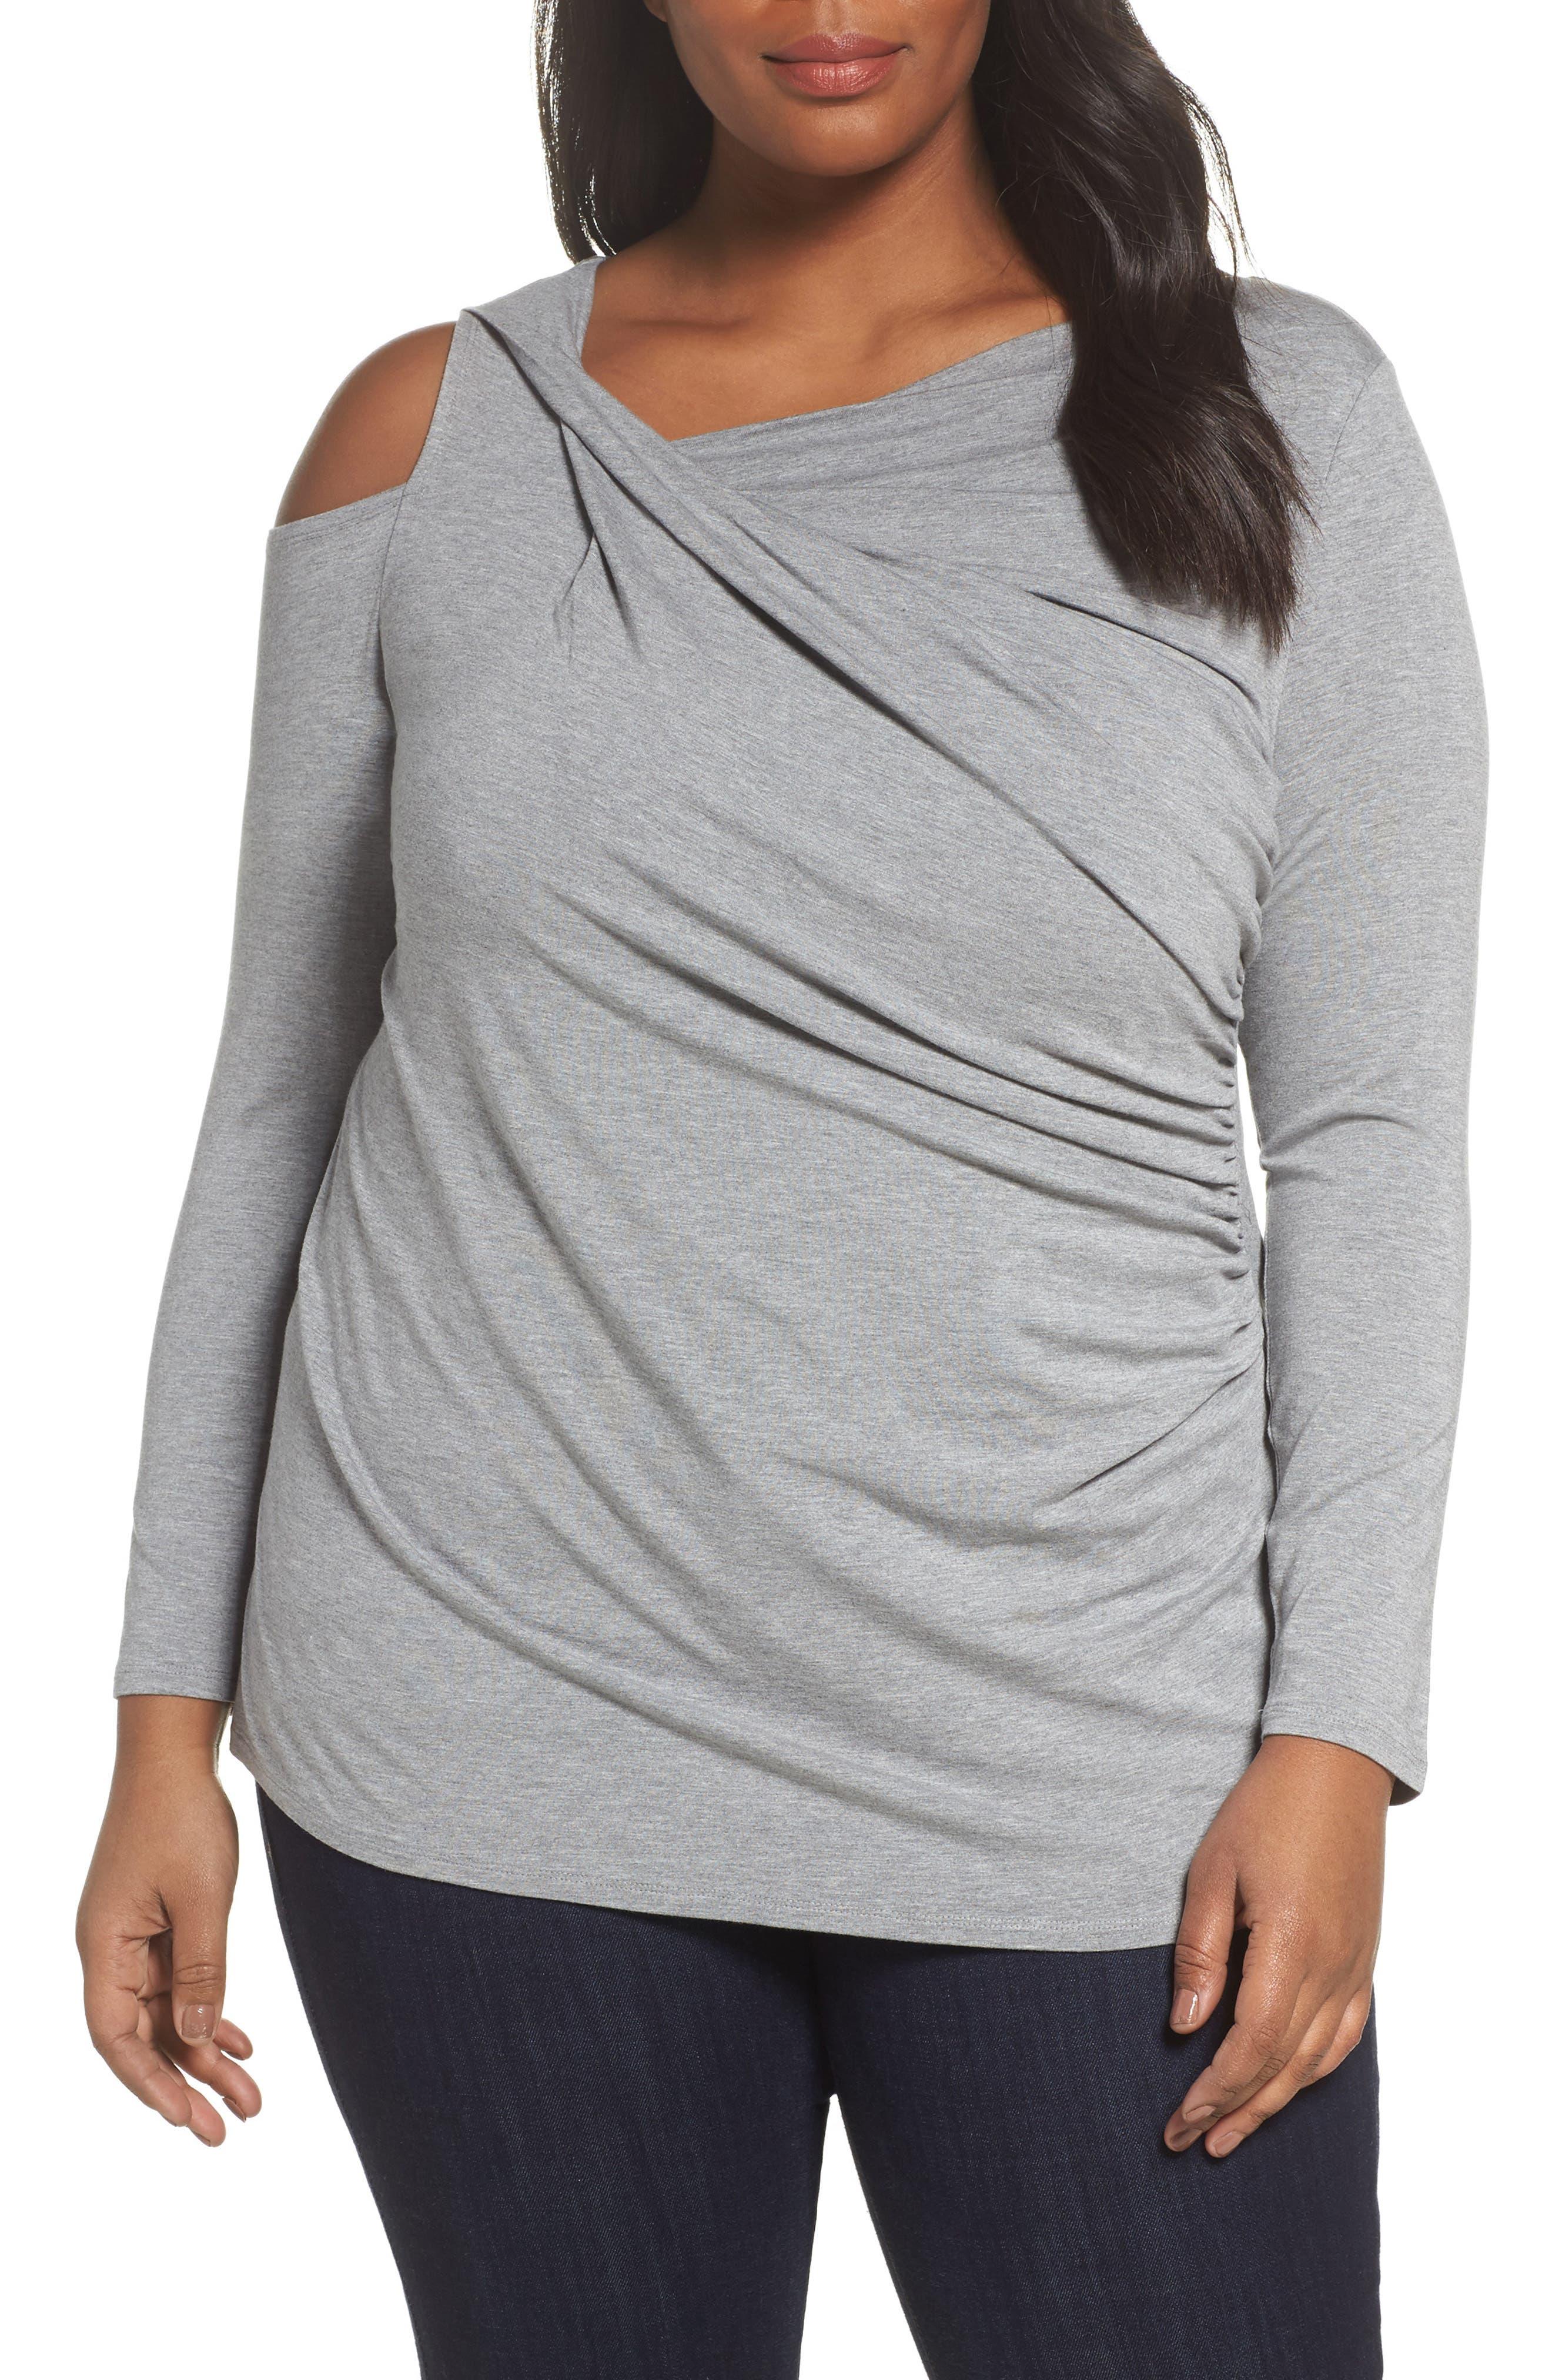 Twisted Cold Shoulder Top,                         Main,                         color, Light Heather Grey